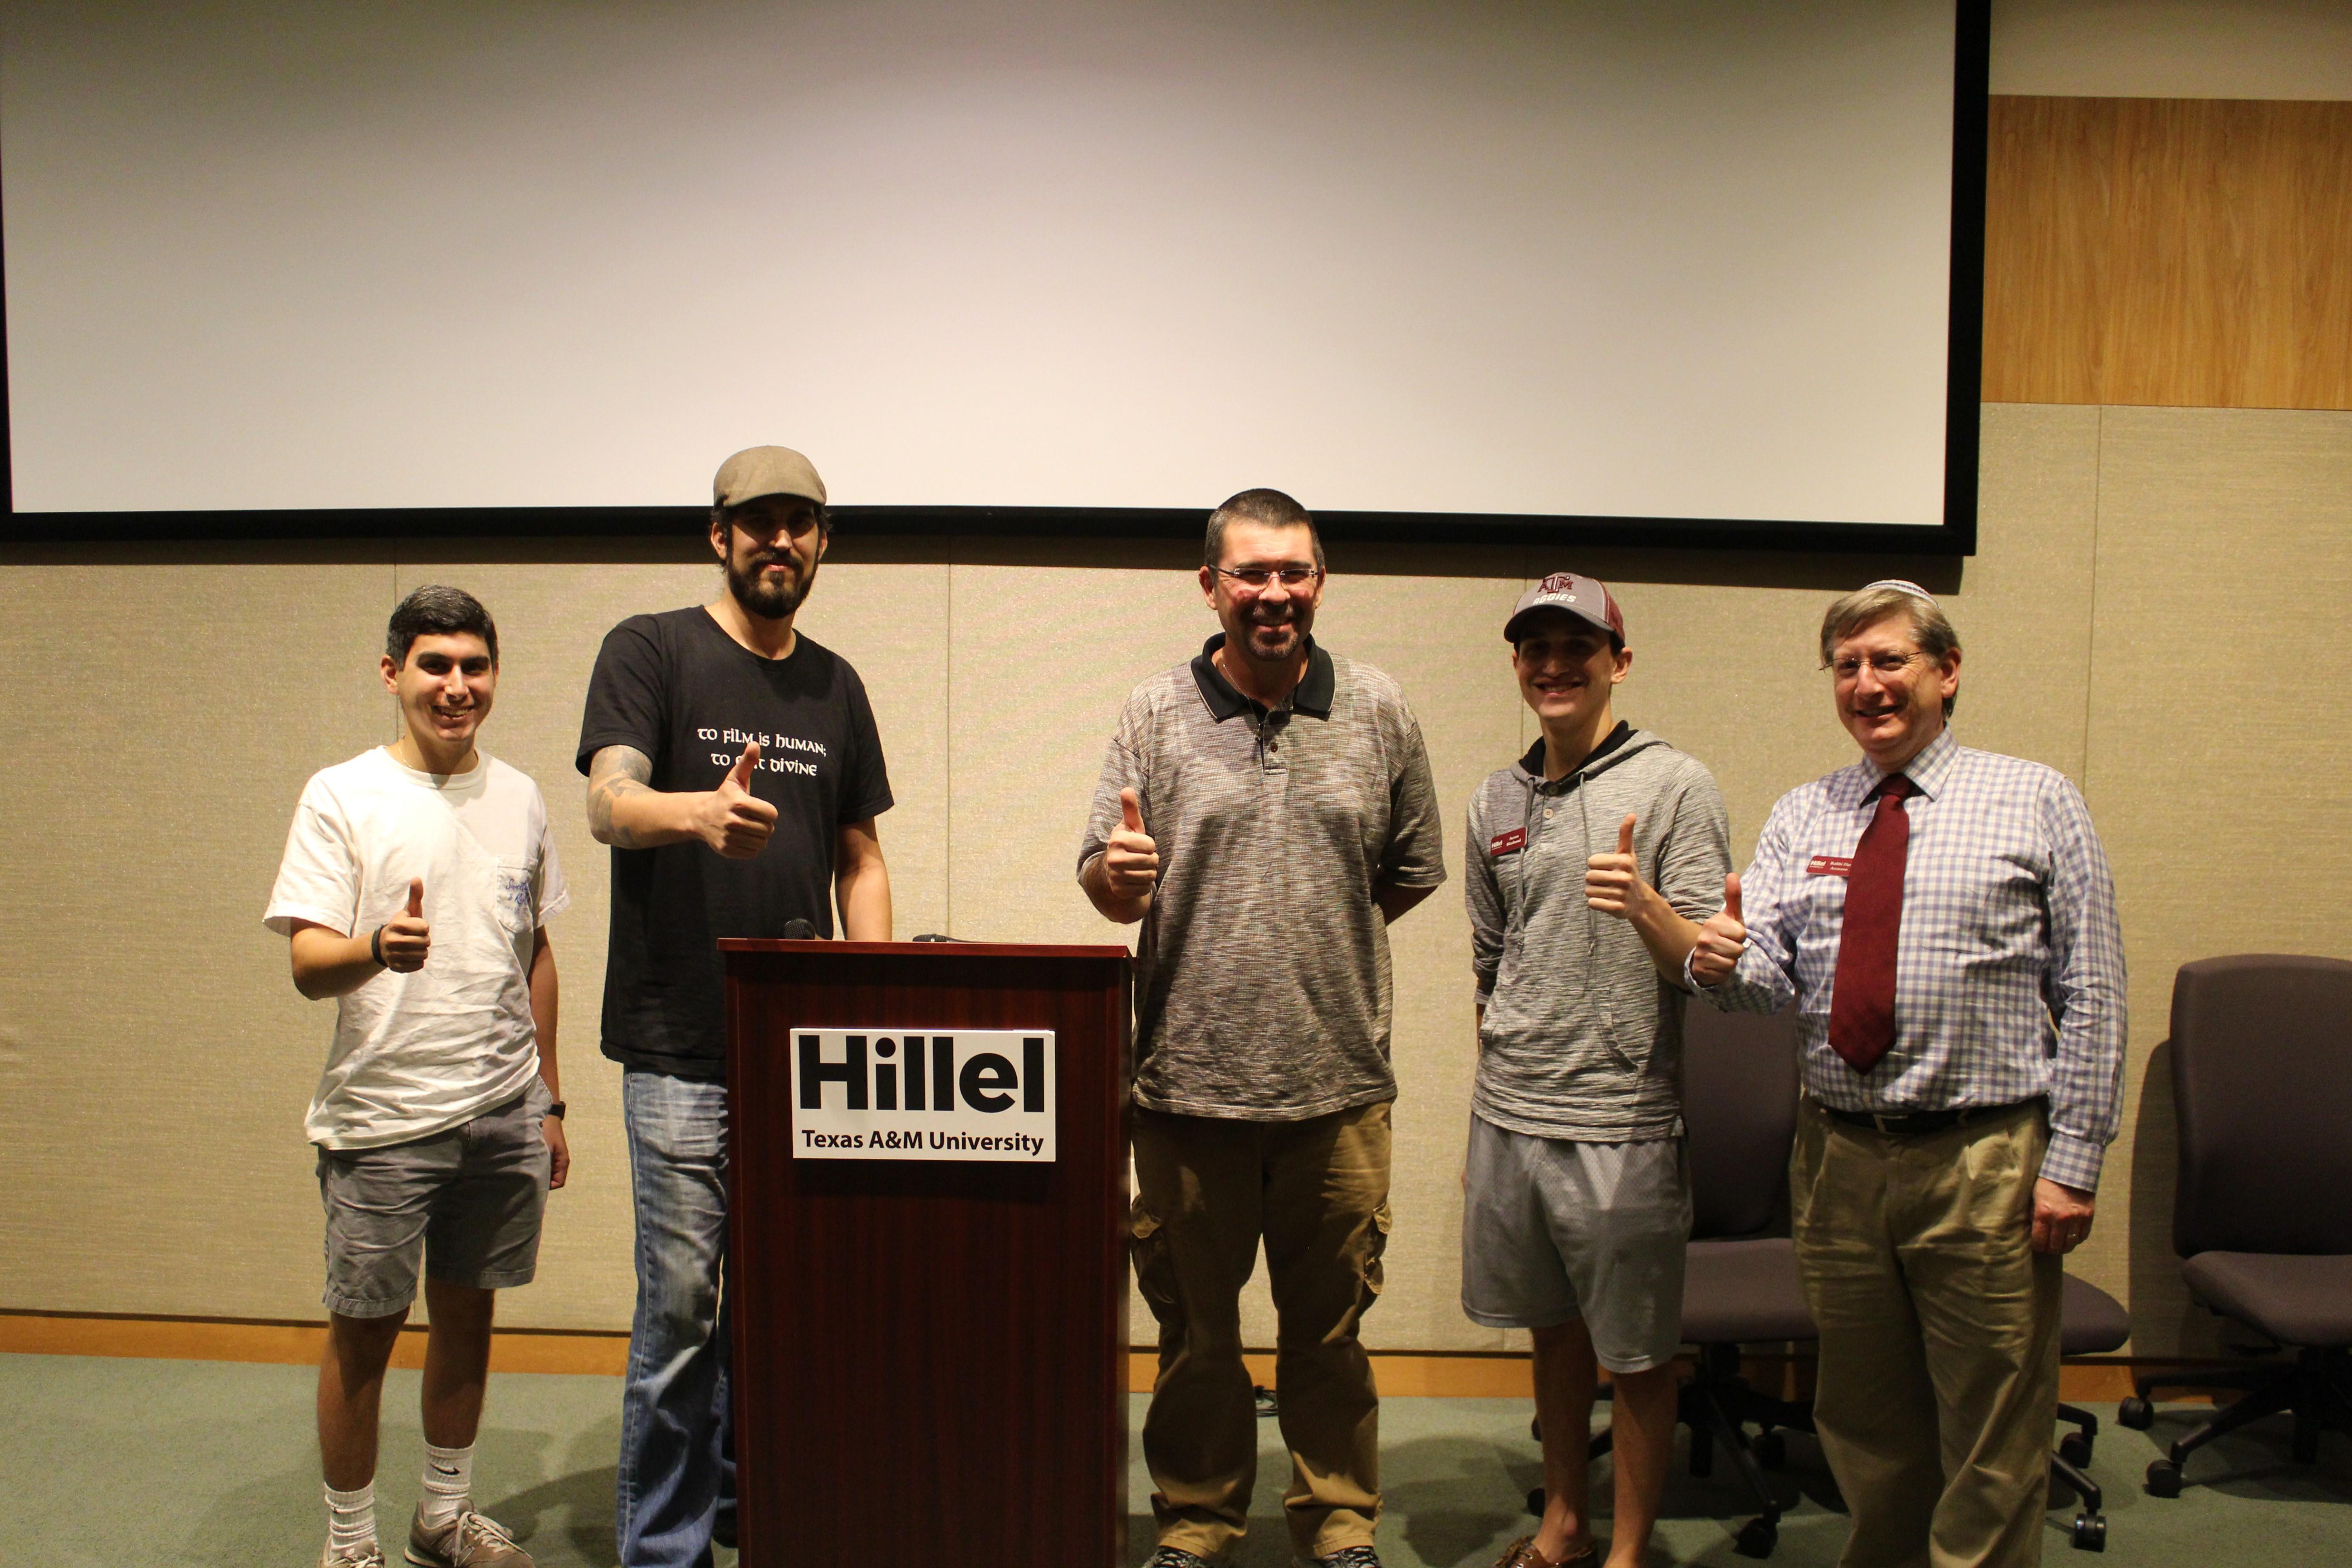 Jewish Ex-Neo-Nazi Visits Hillel on Nov. 16th